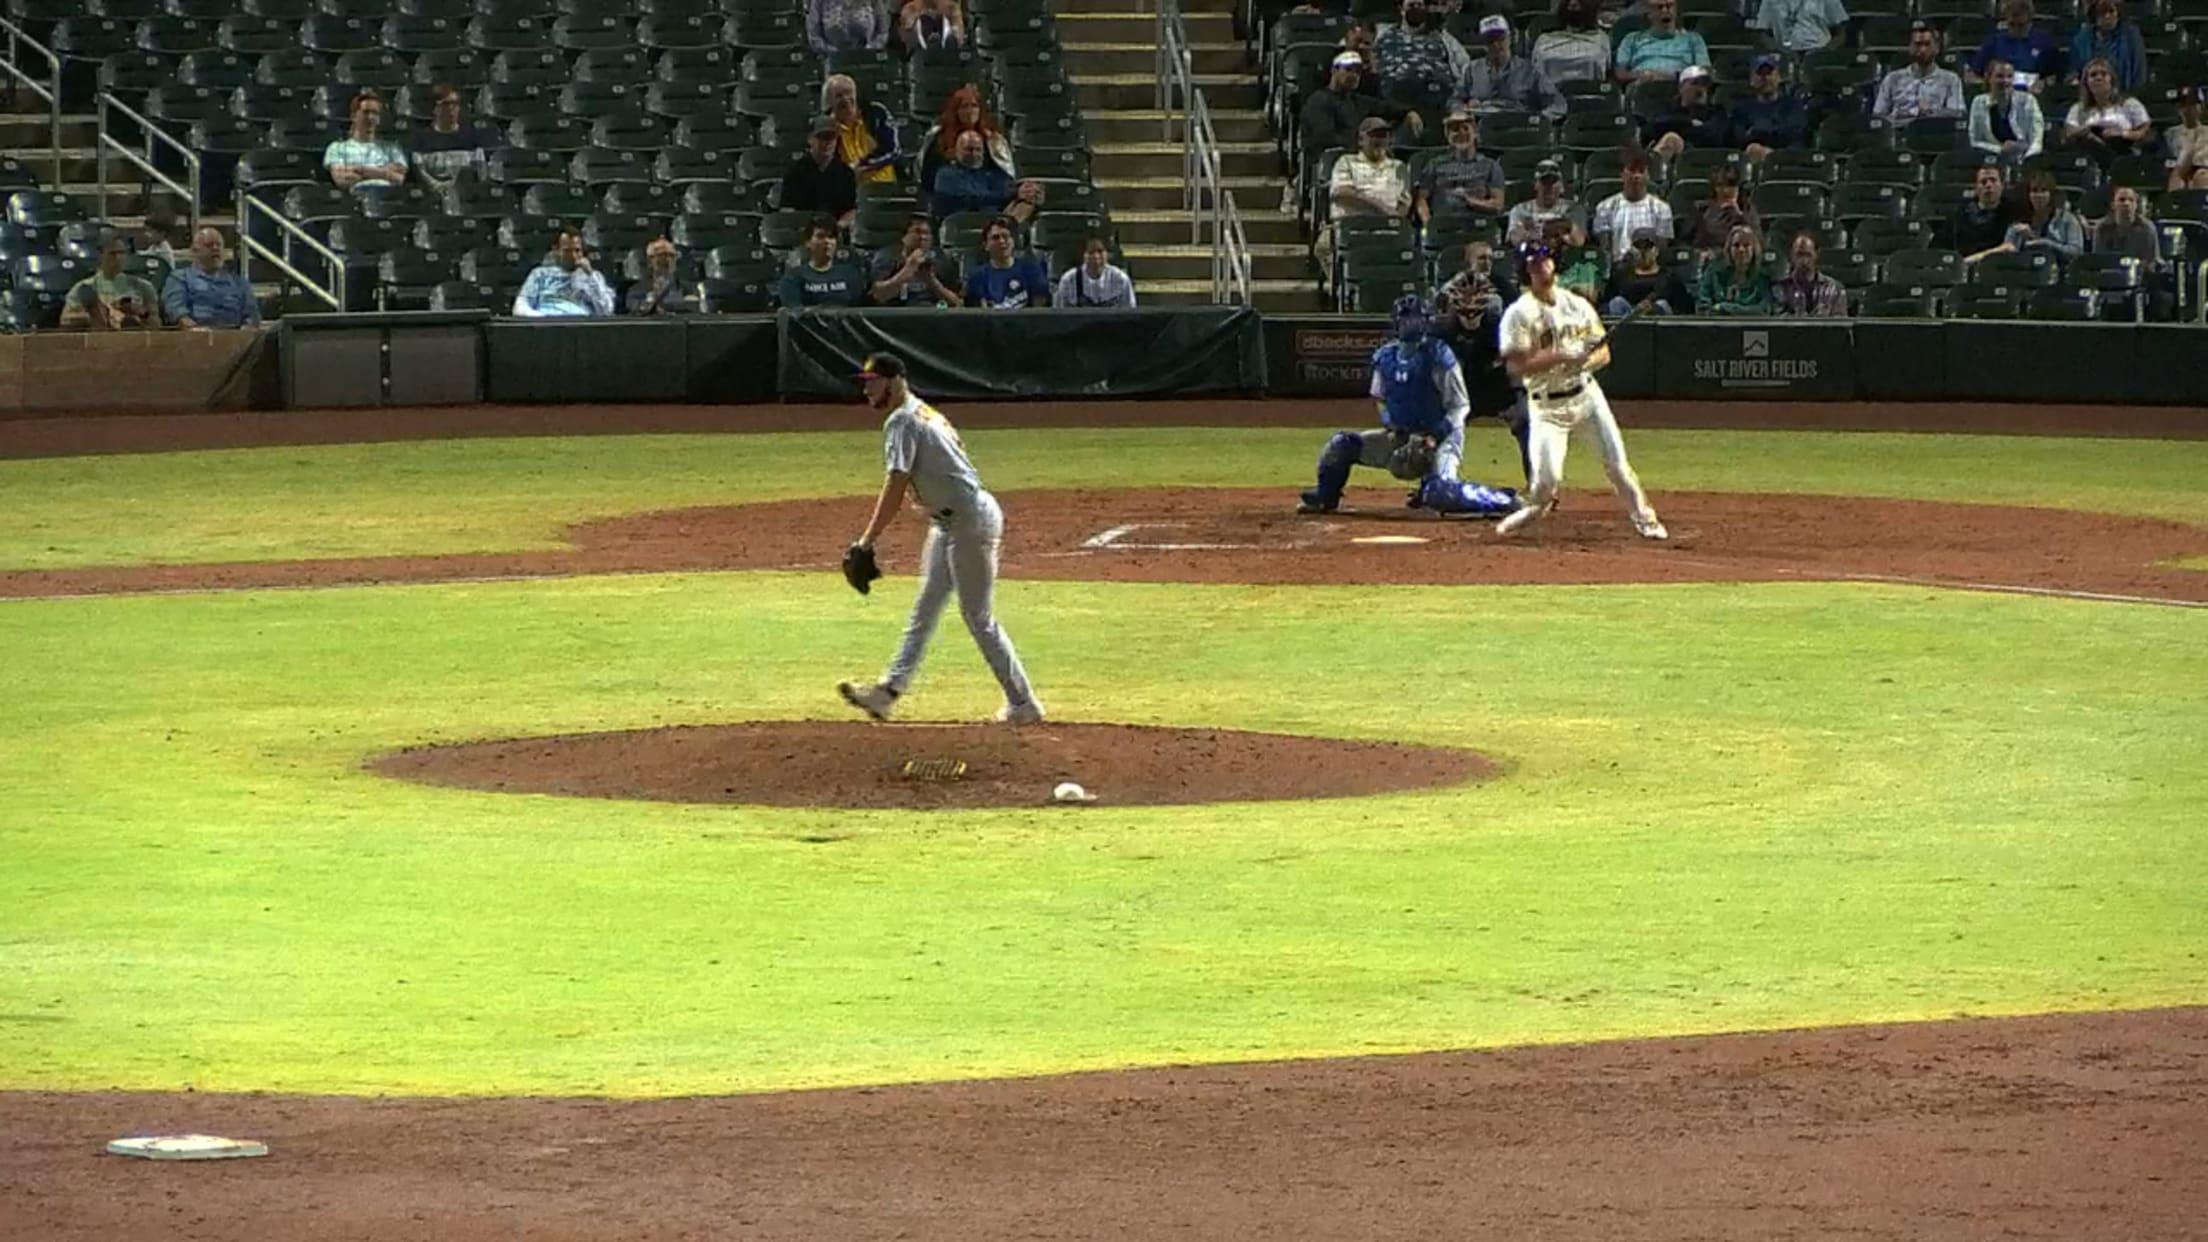 Joey Wiemer's four-hit game